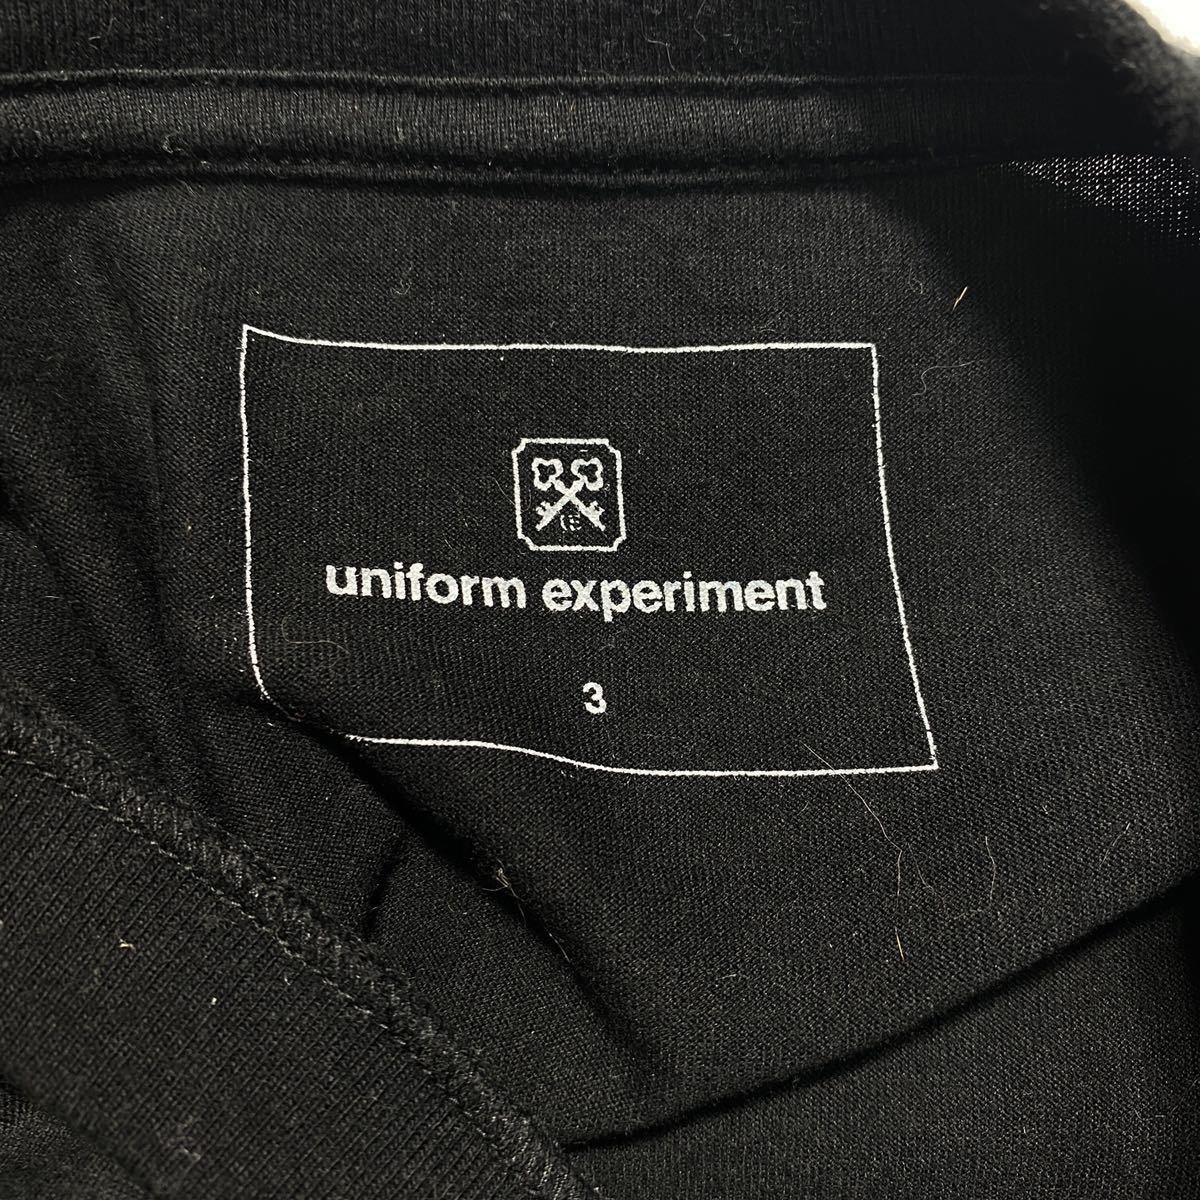 【3】uniform experiment Fragment design Tee ユニフォーム エクスペリメント フラグメントデザイン Tシャツ ブラック G485_画像5